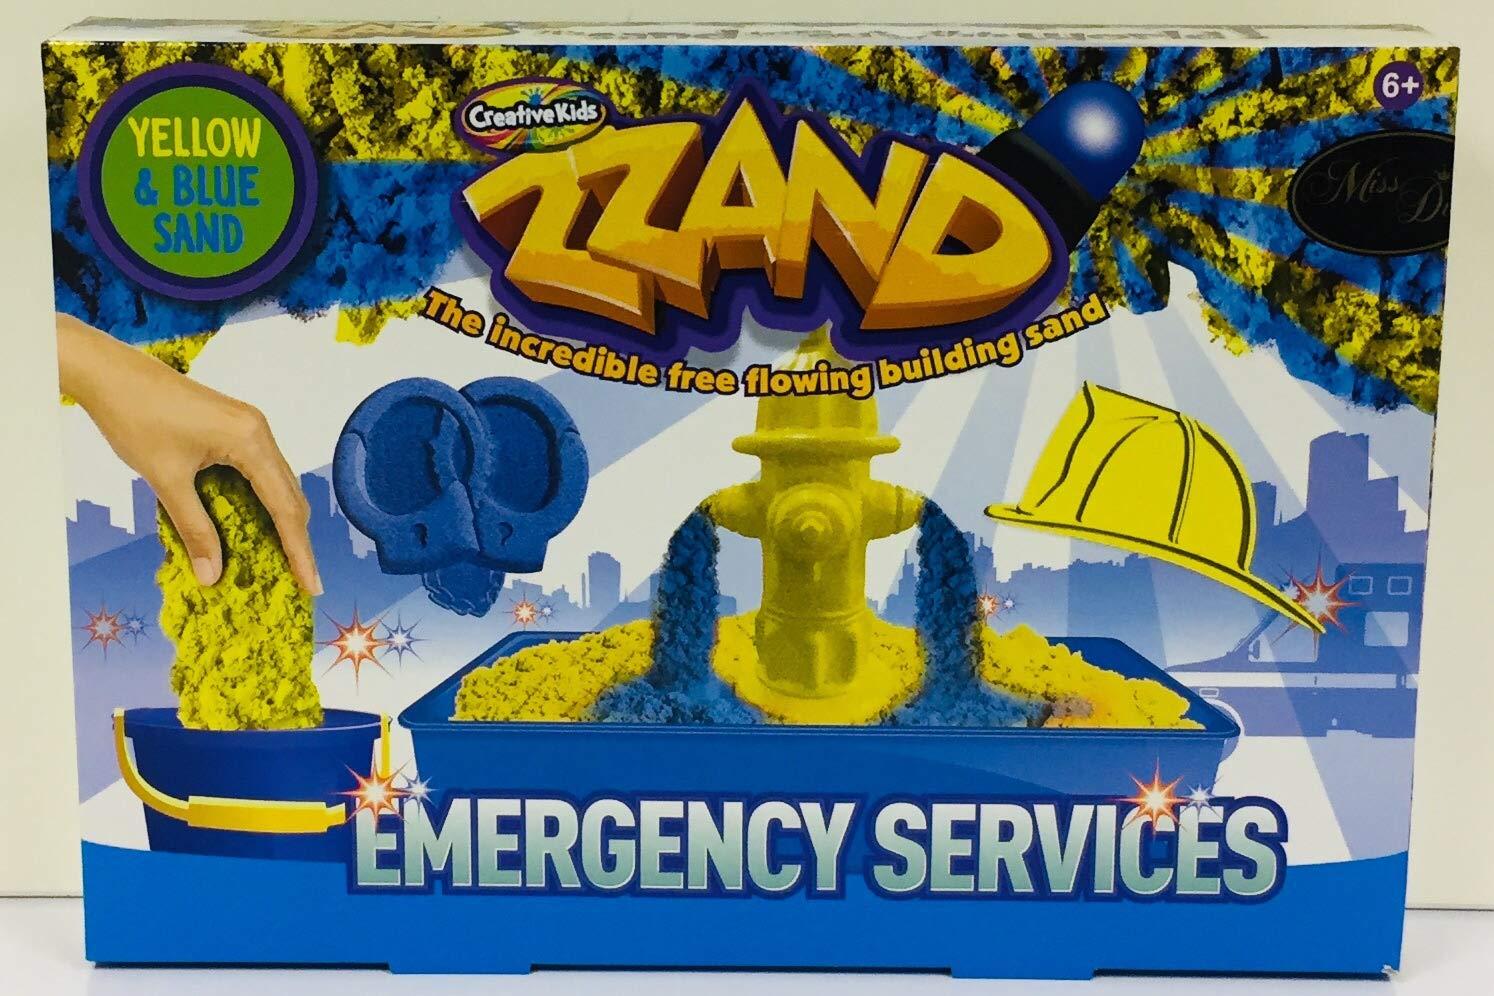 Crown Crest Zzand Emergency Services Sand Art Playset